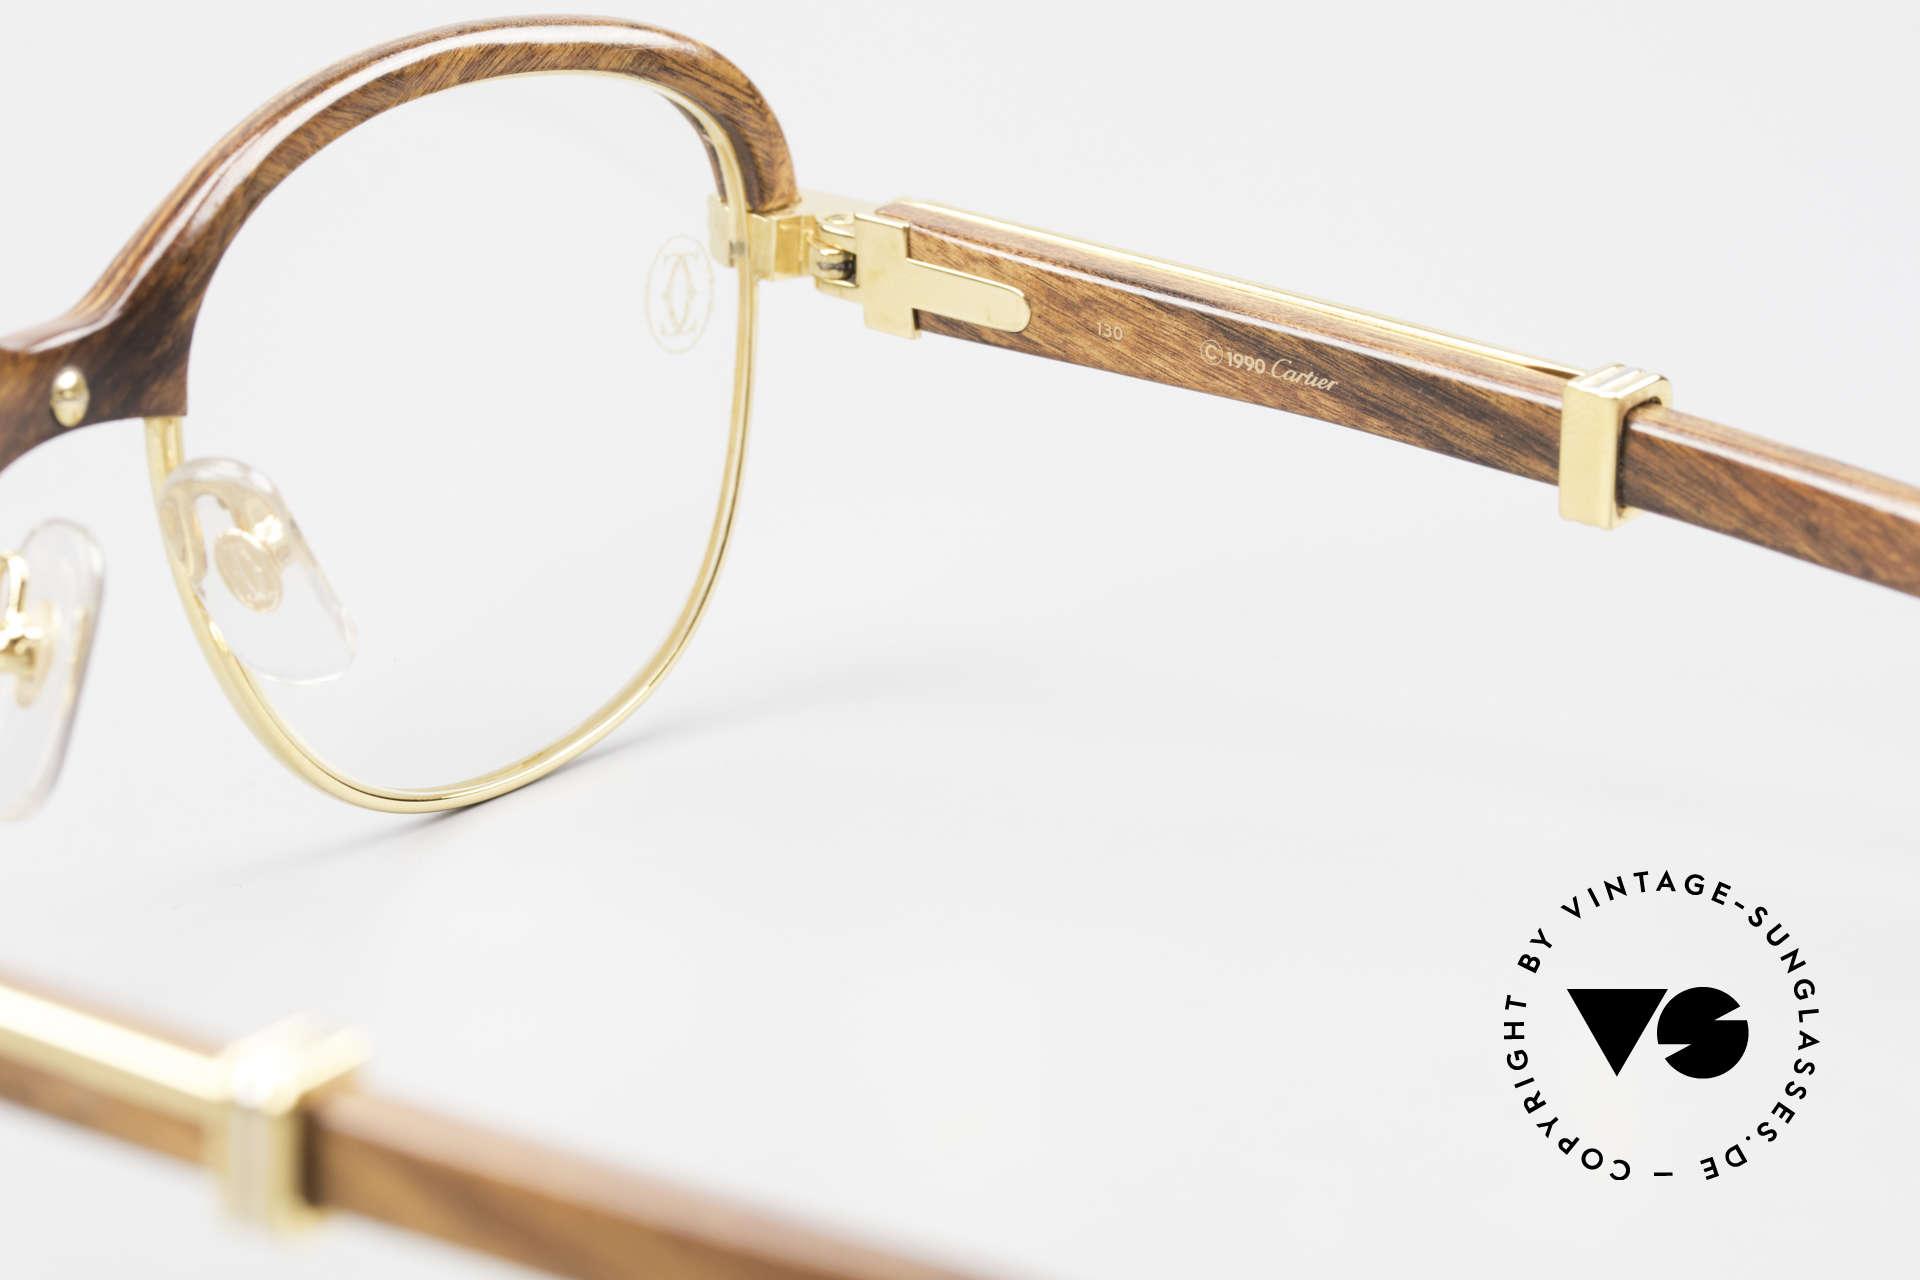 Cartier Malmaison Diego Maradona Wood Glasses, Size: small, Made for Men and Women